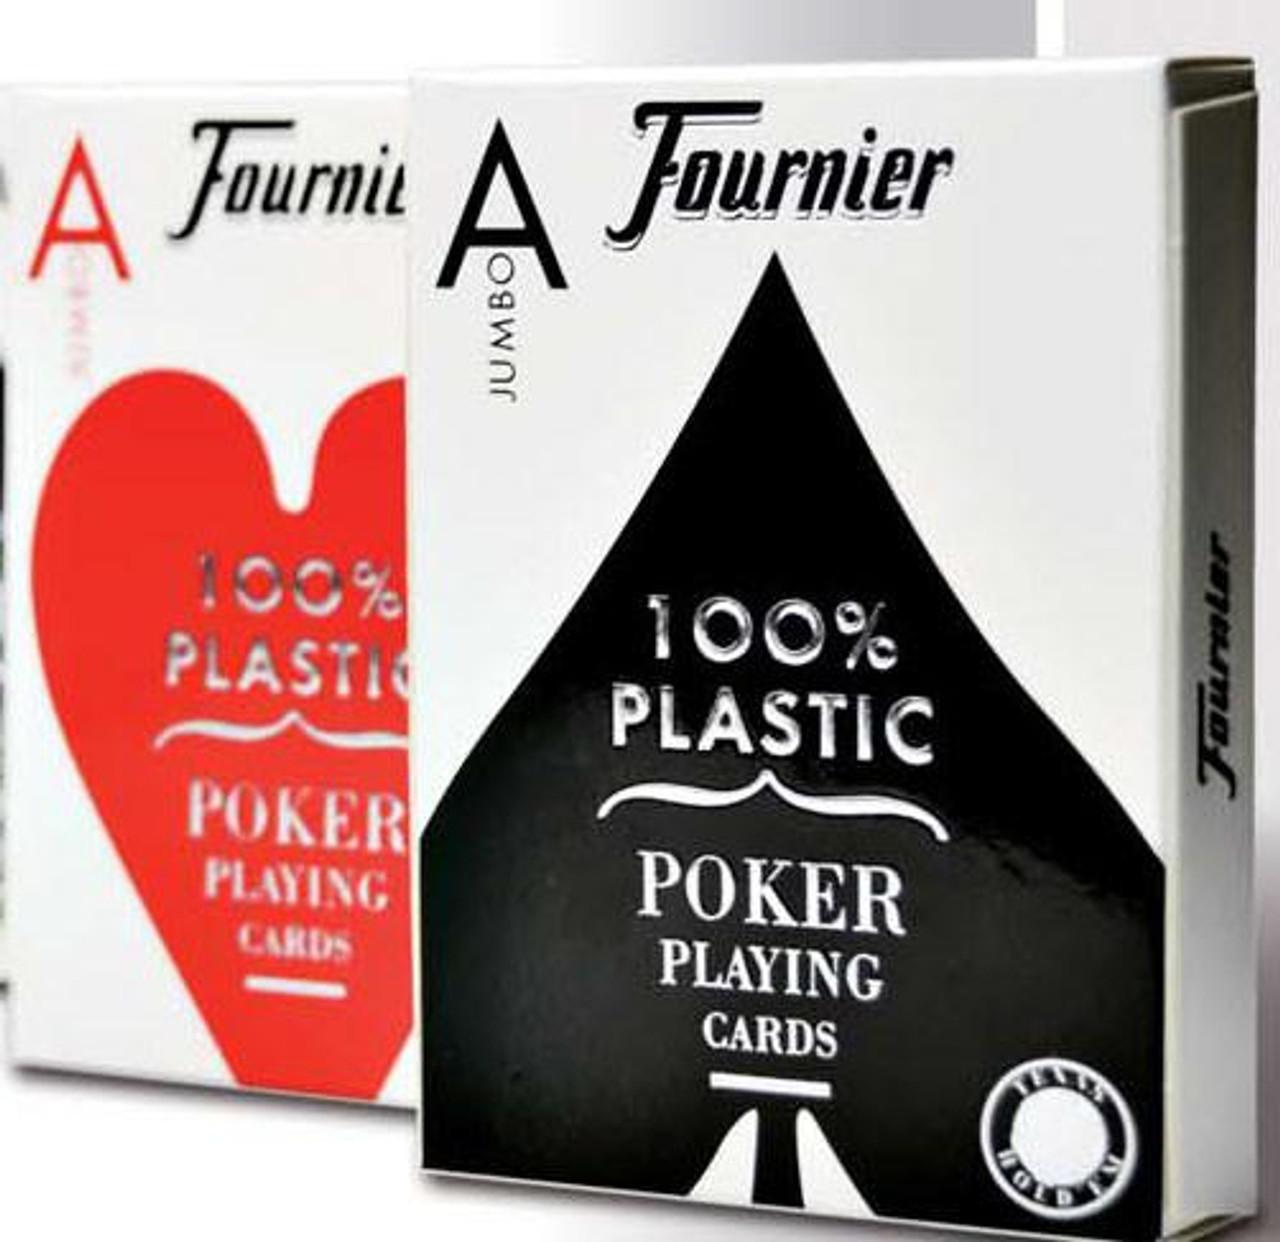 Carti poker 100% plastic Fournier 2800 cu jumbo index si spate rosu